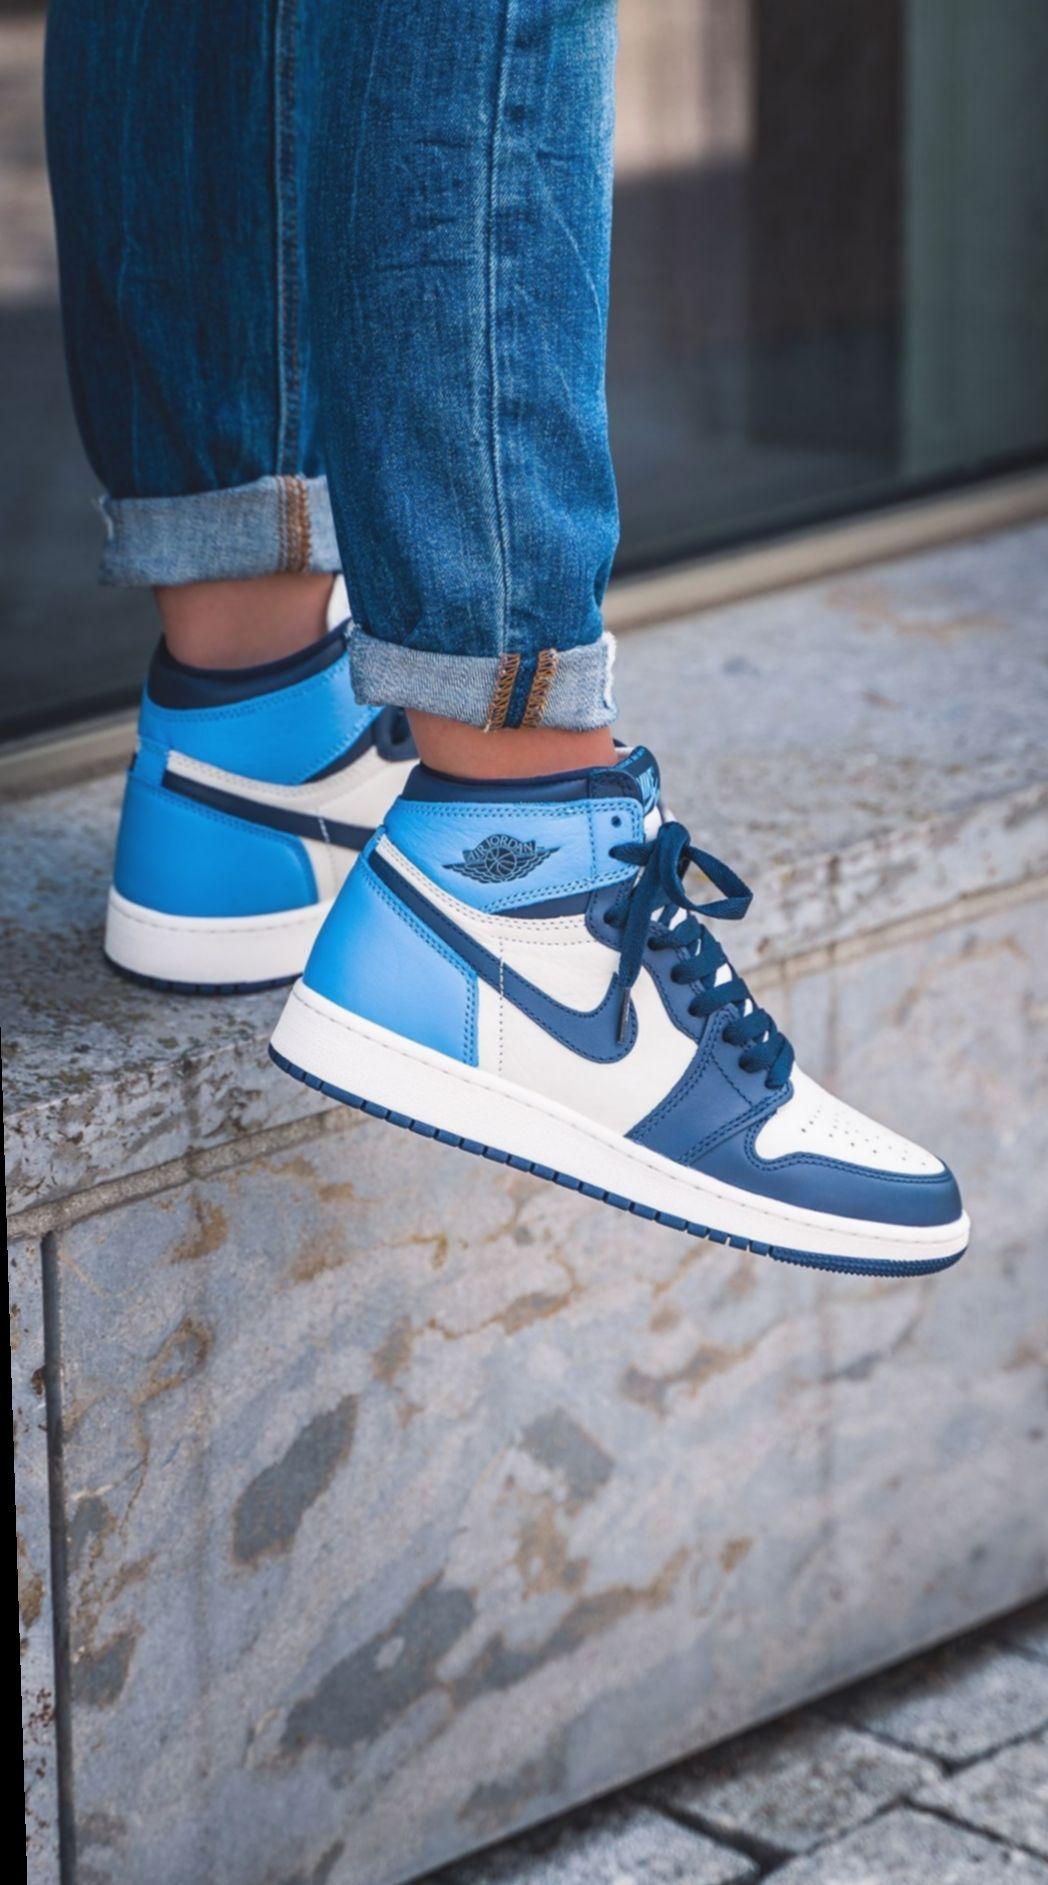 ✓ Shoes Sneakers Jordans Swag #blickartmaterials